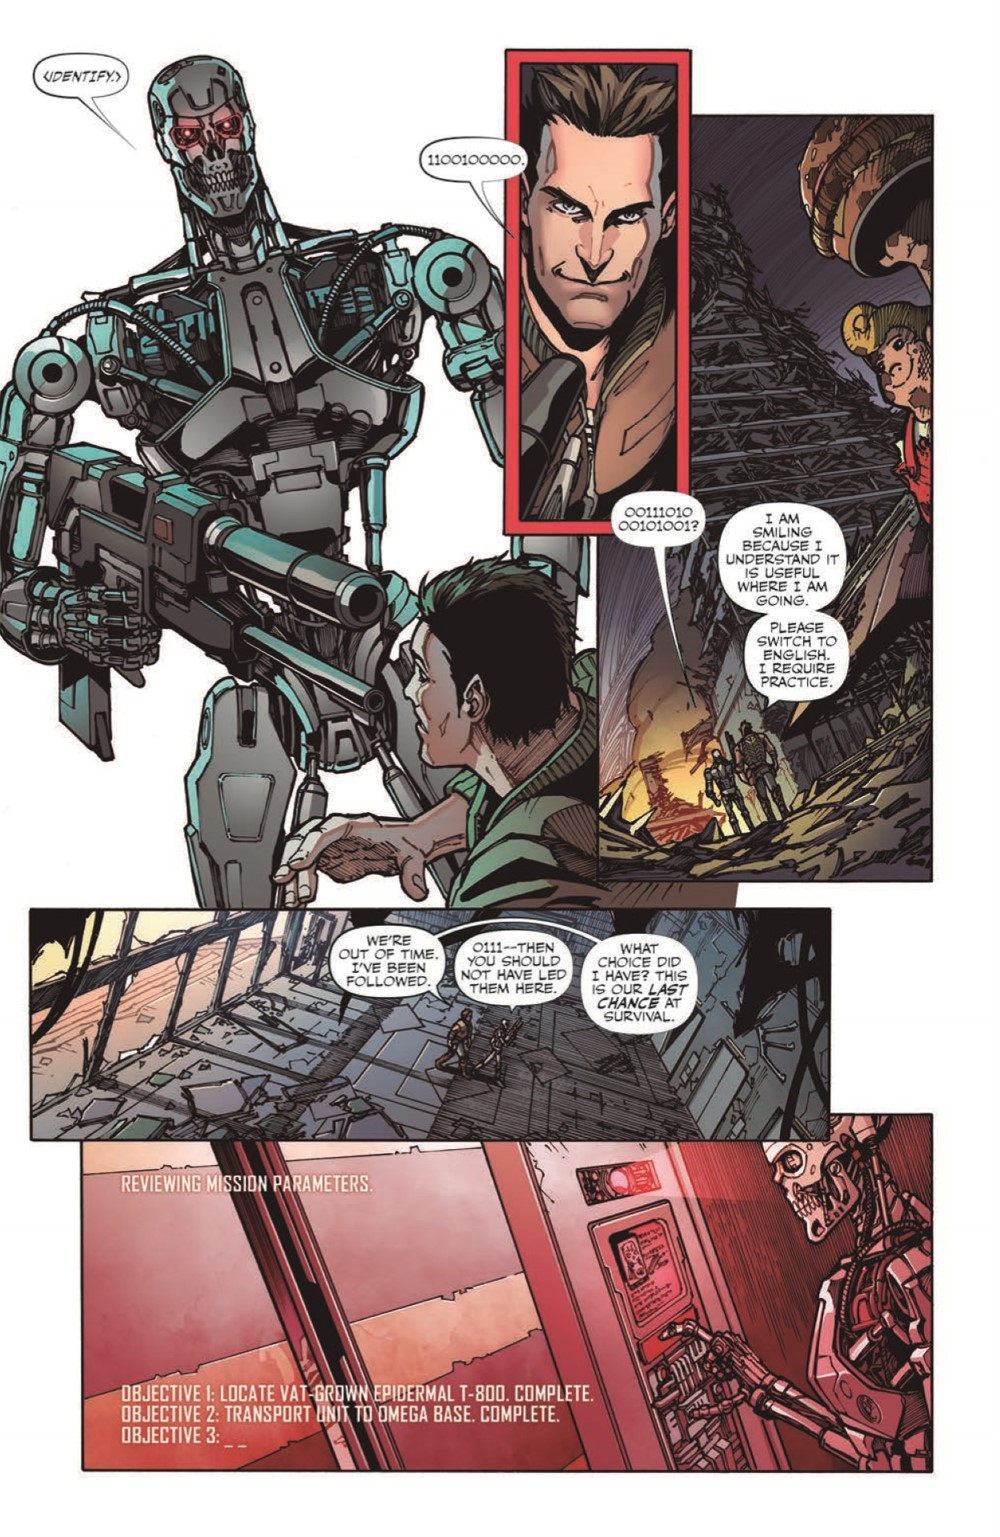 TF-vs-TERMINATOR-pr-7 ComicList Previews: TRANSFORMERS VS THE TERMINATOR ENEMY OF MY ENEMY TP